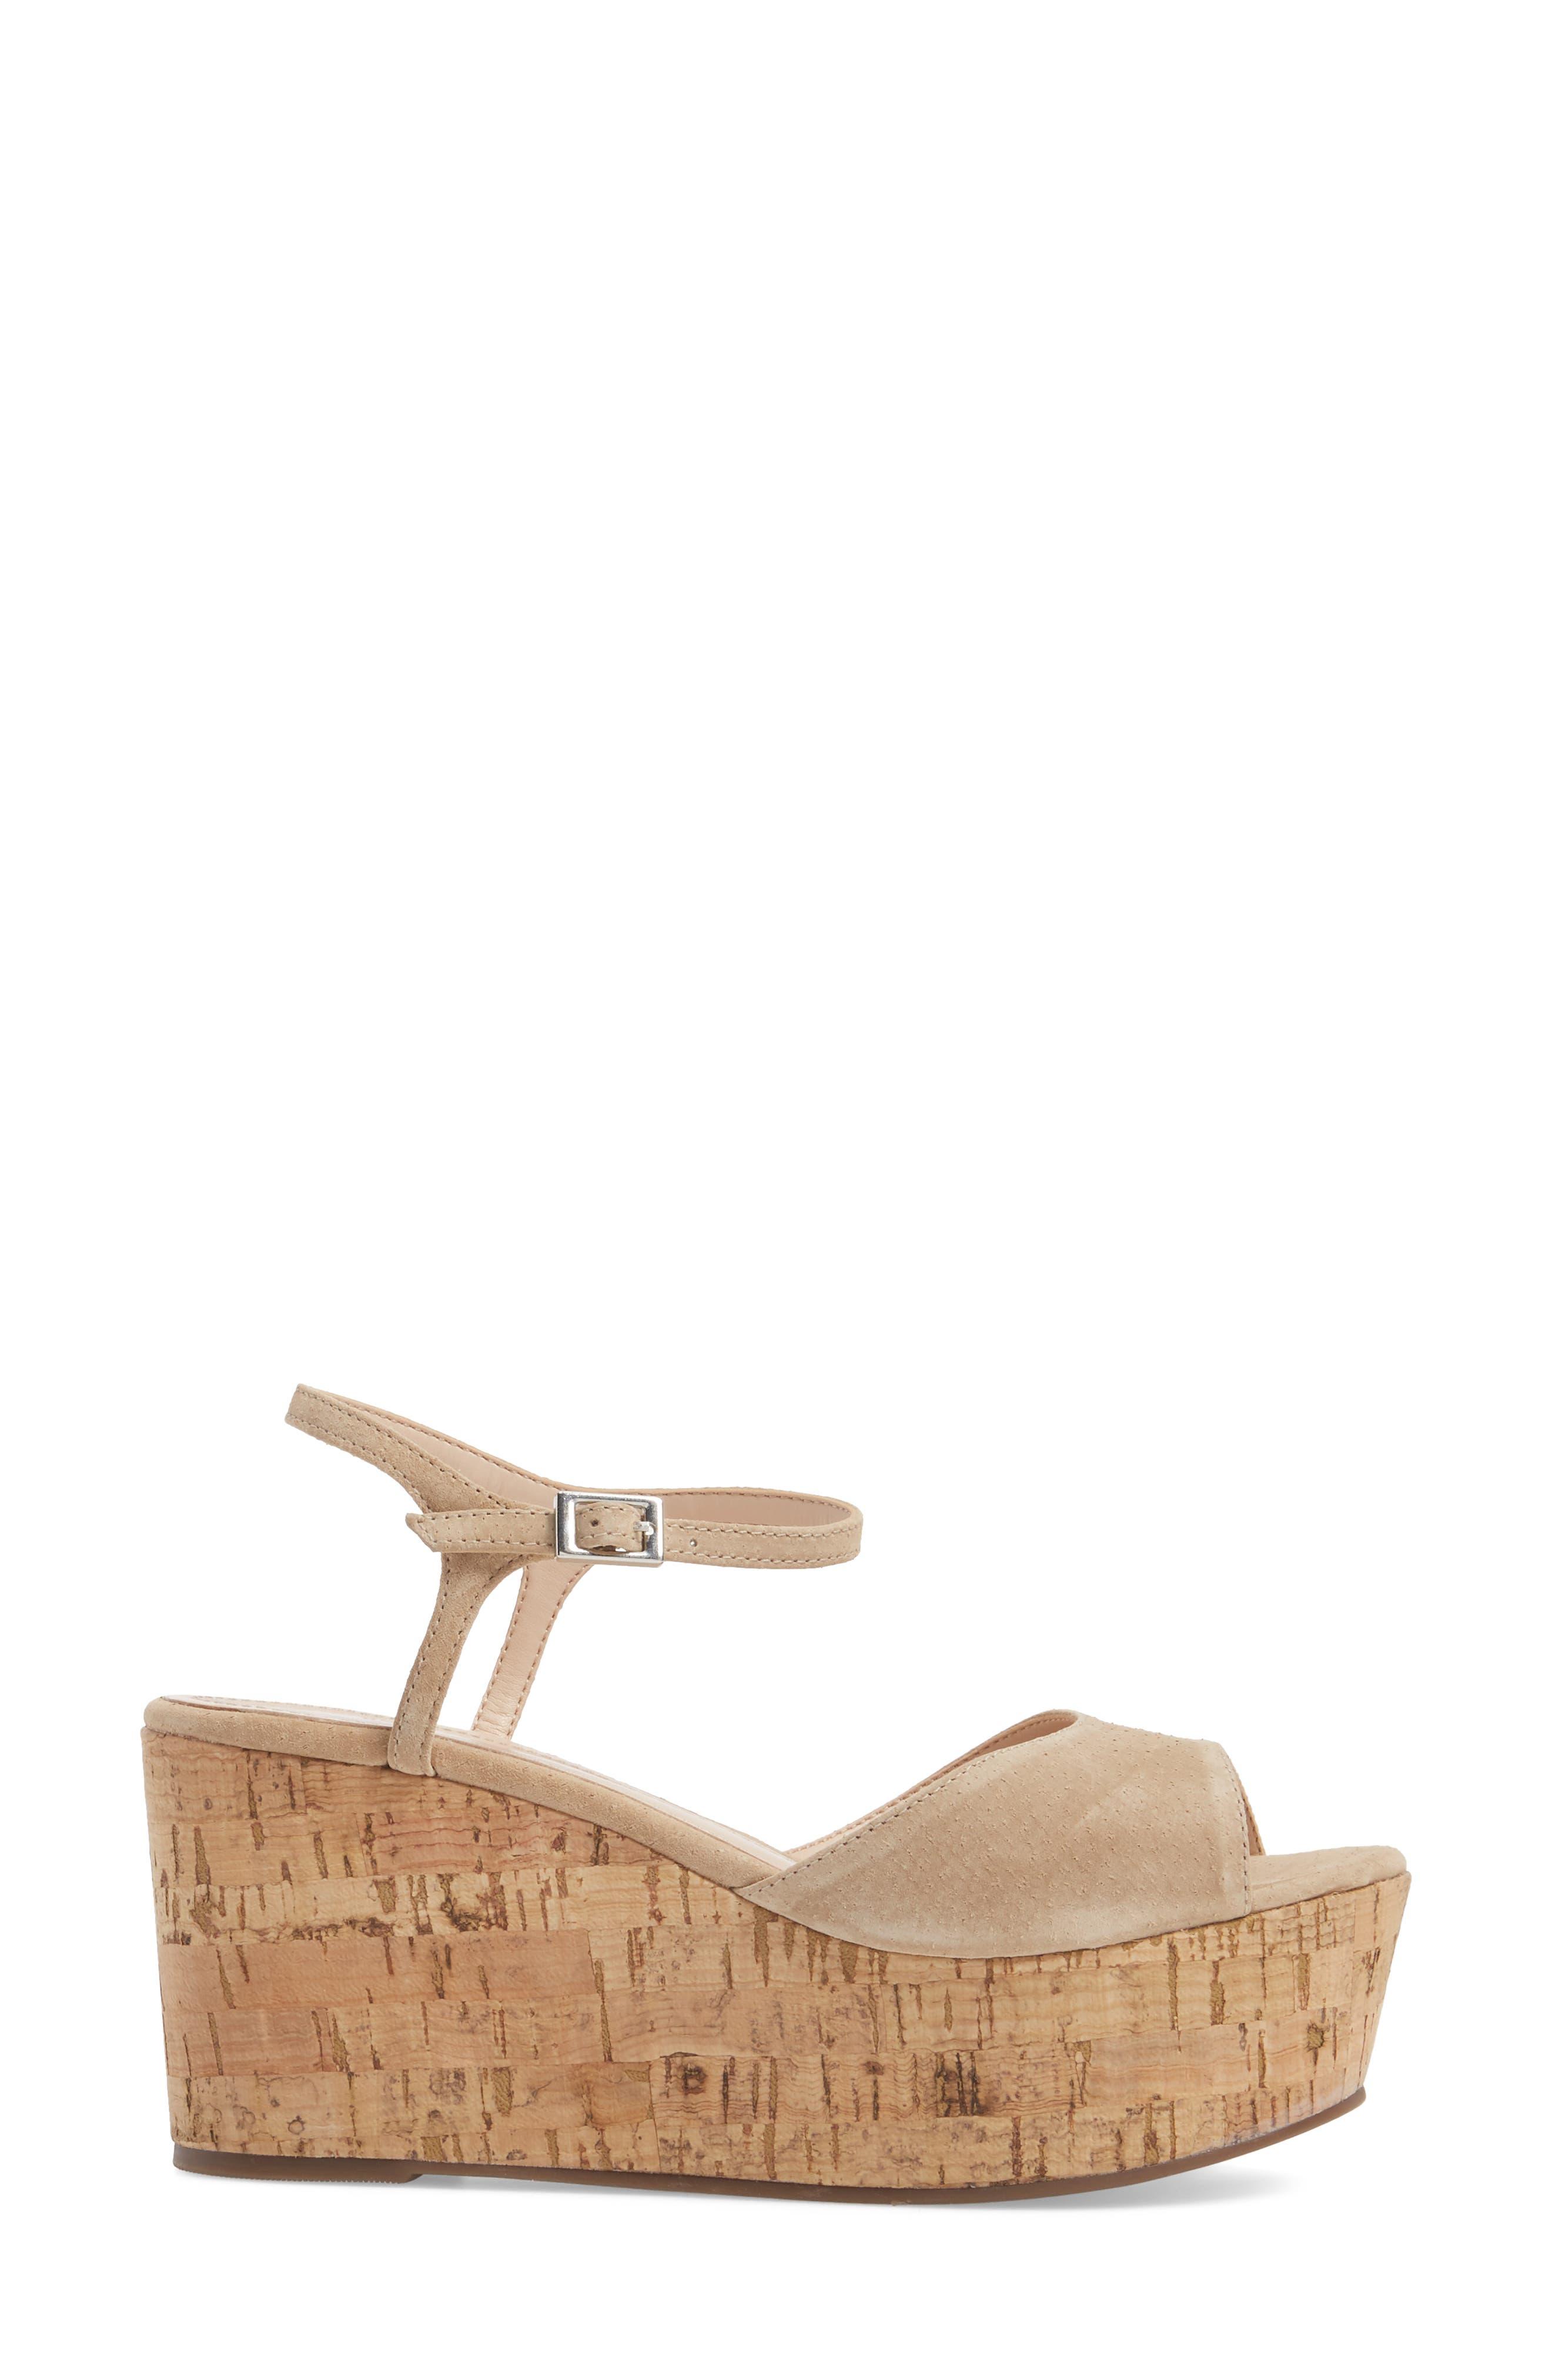 Heloise Platform Wedge Sandal,                             Alternate thumbnail 3, color,                             250